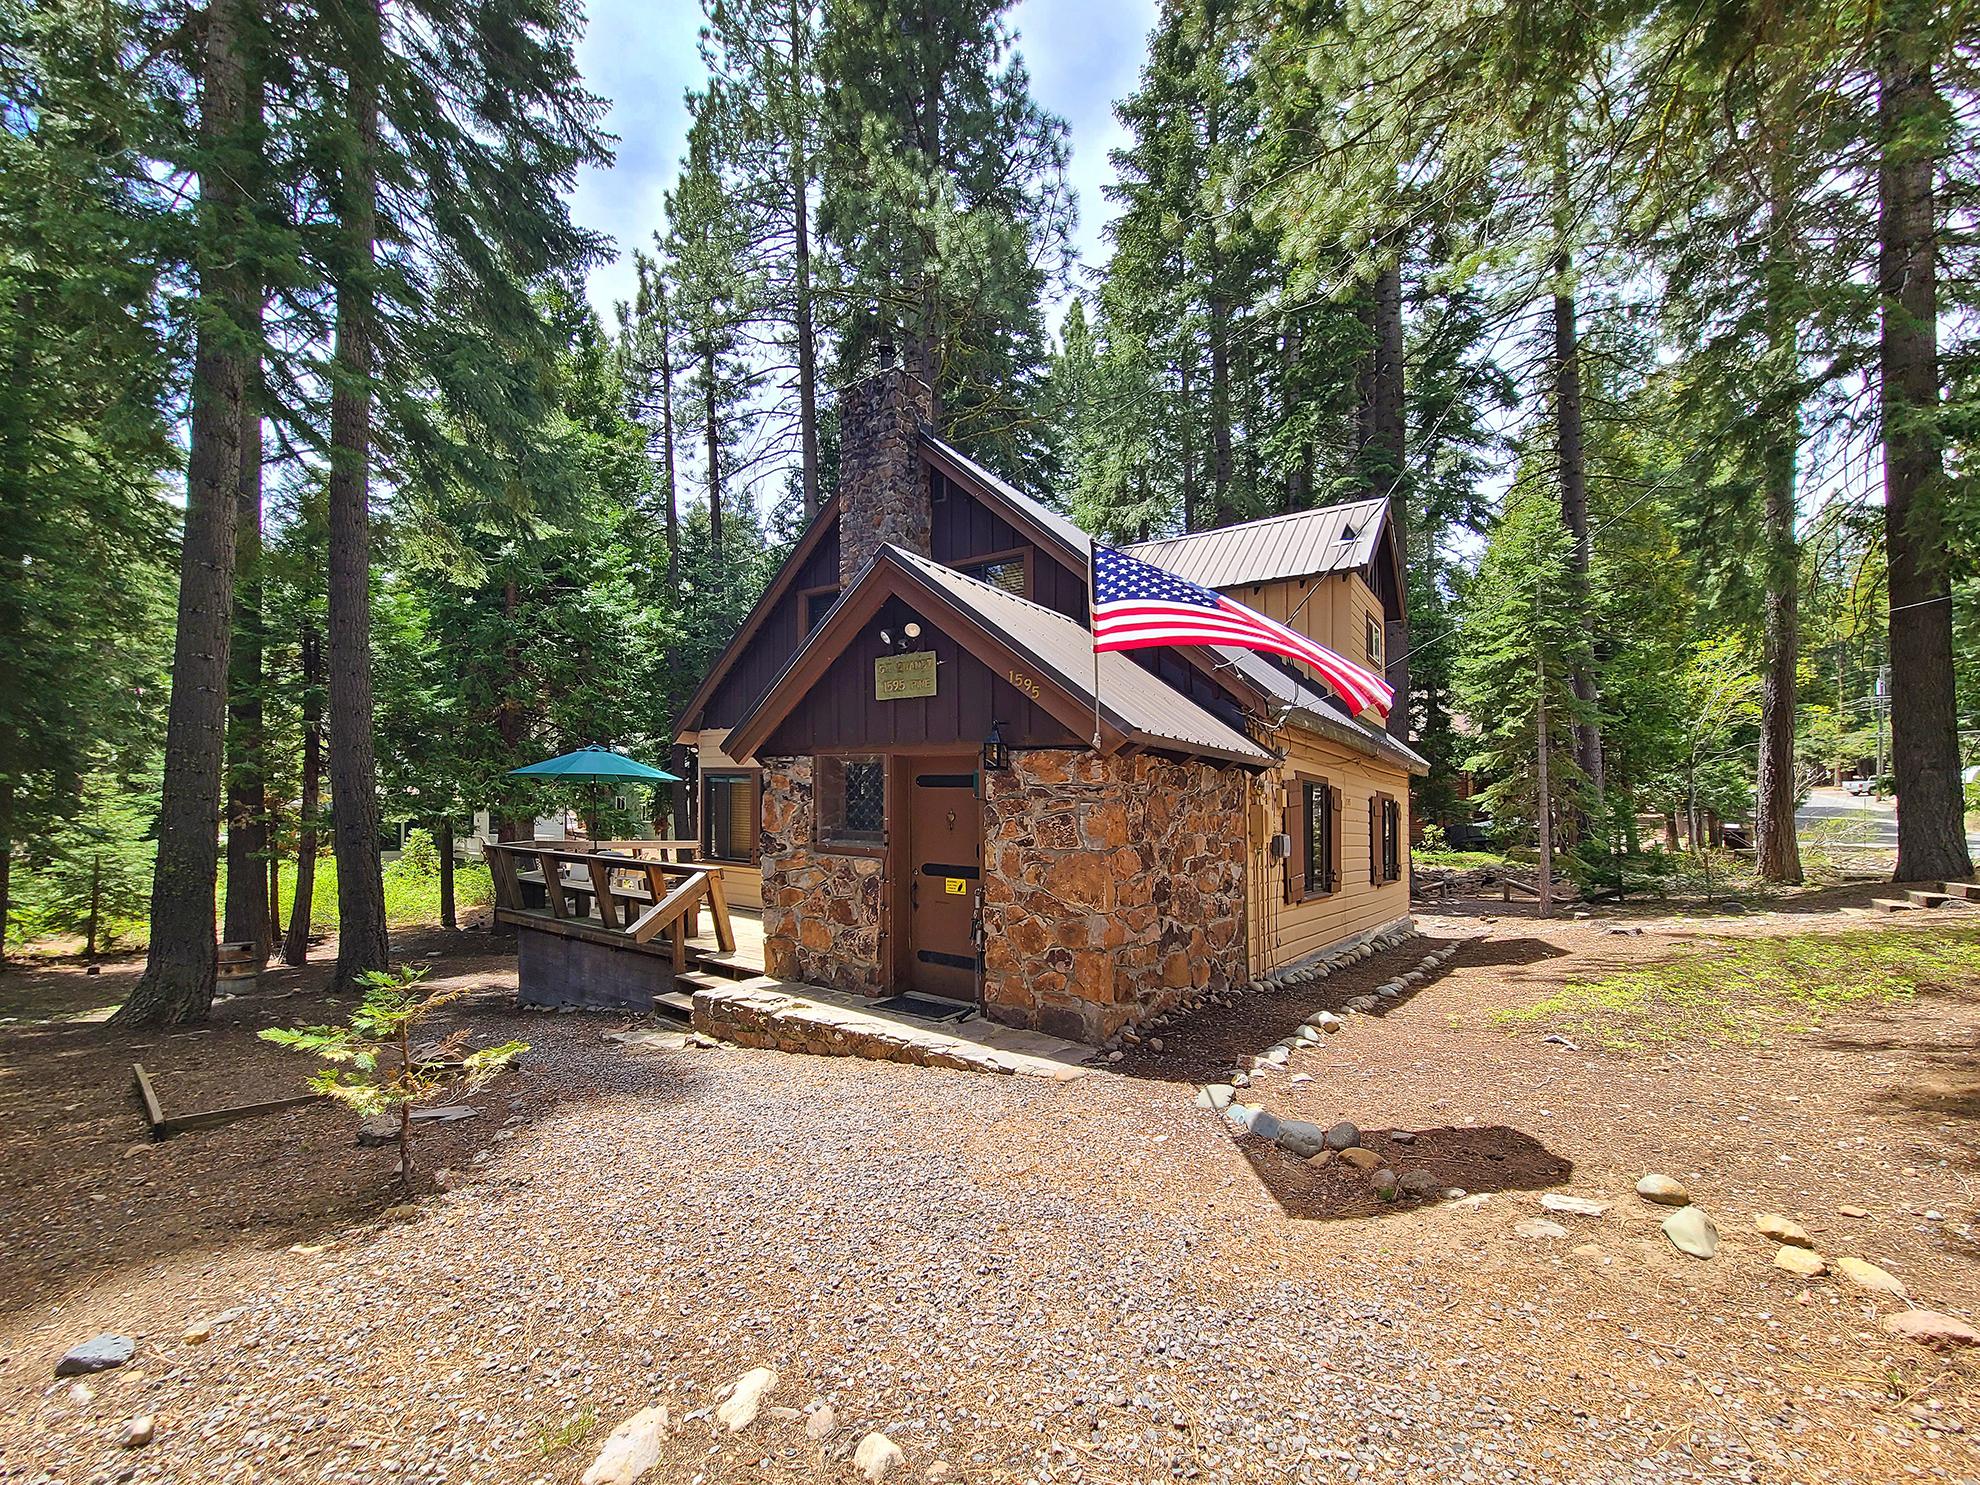 Image for Quandt Cabin